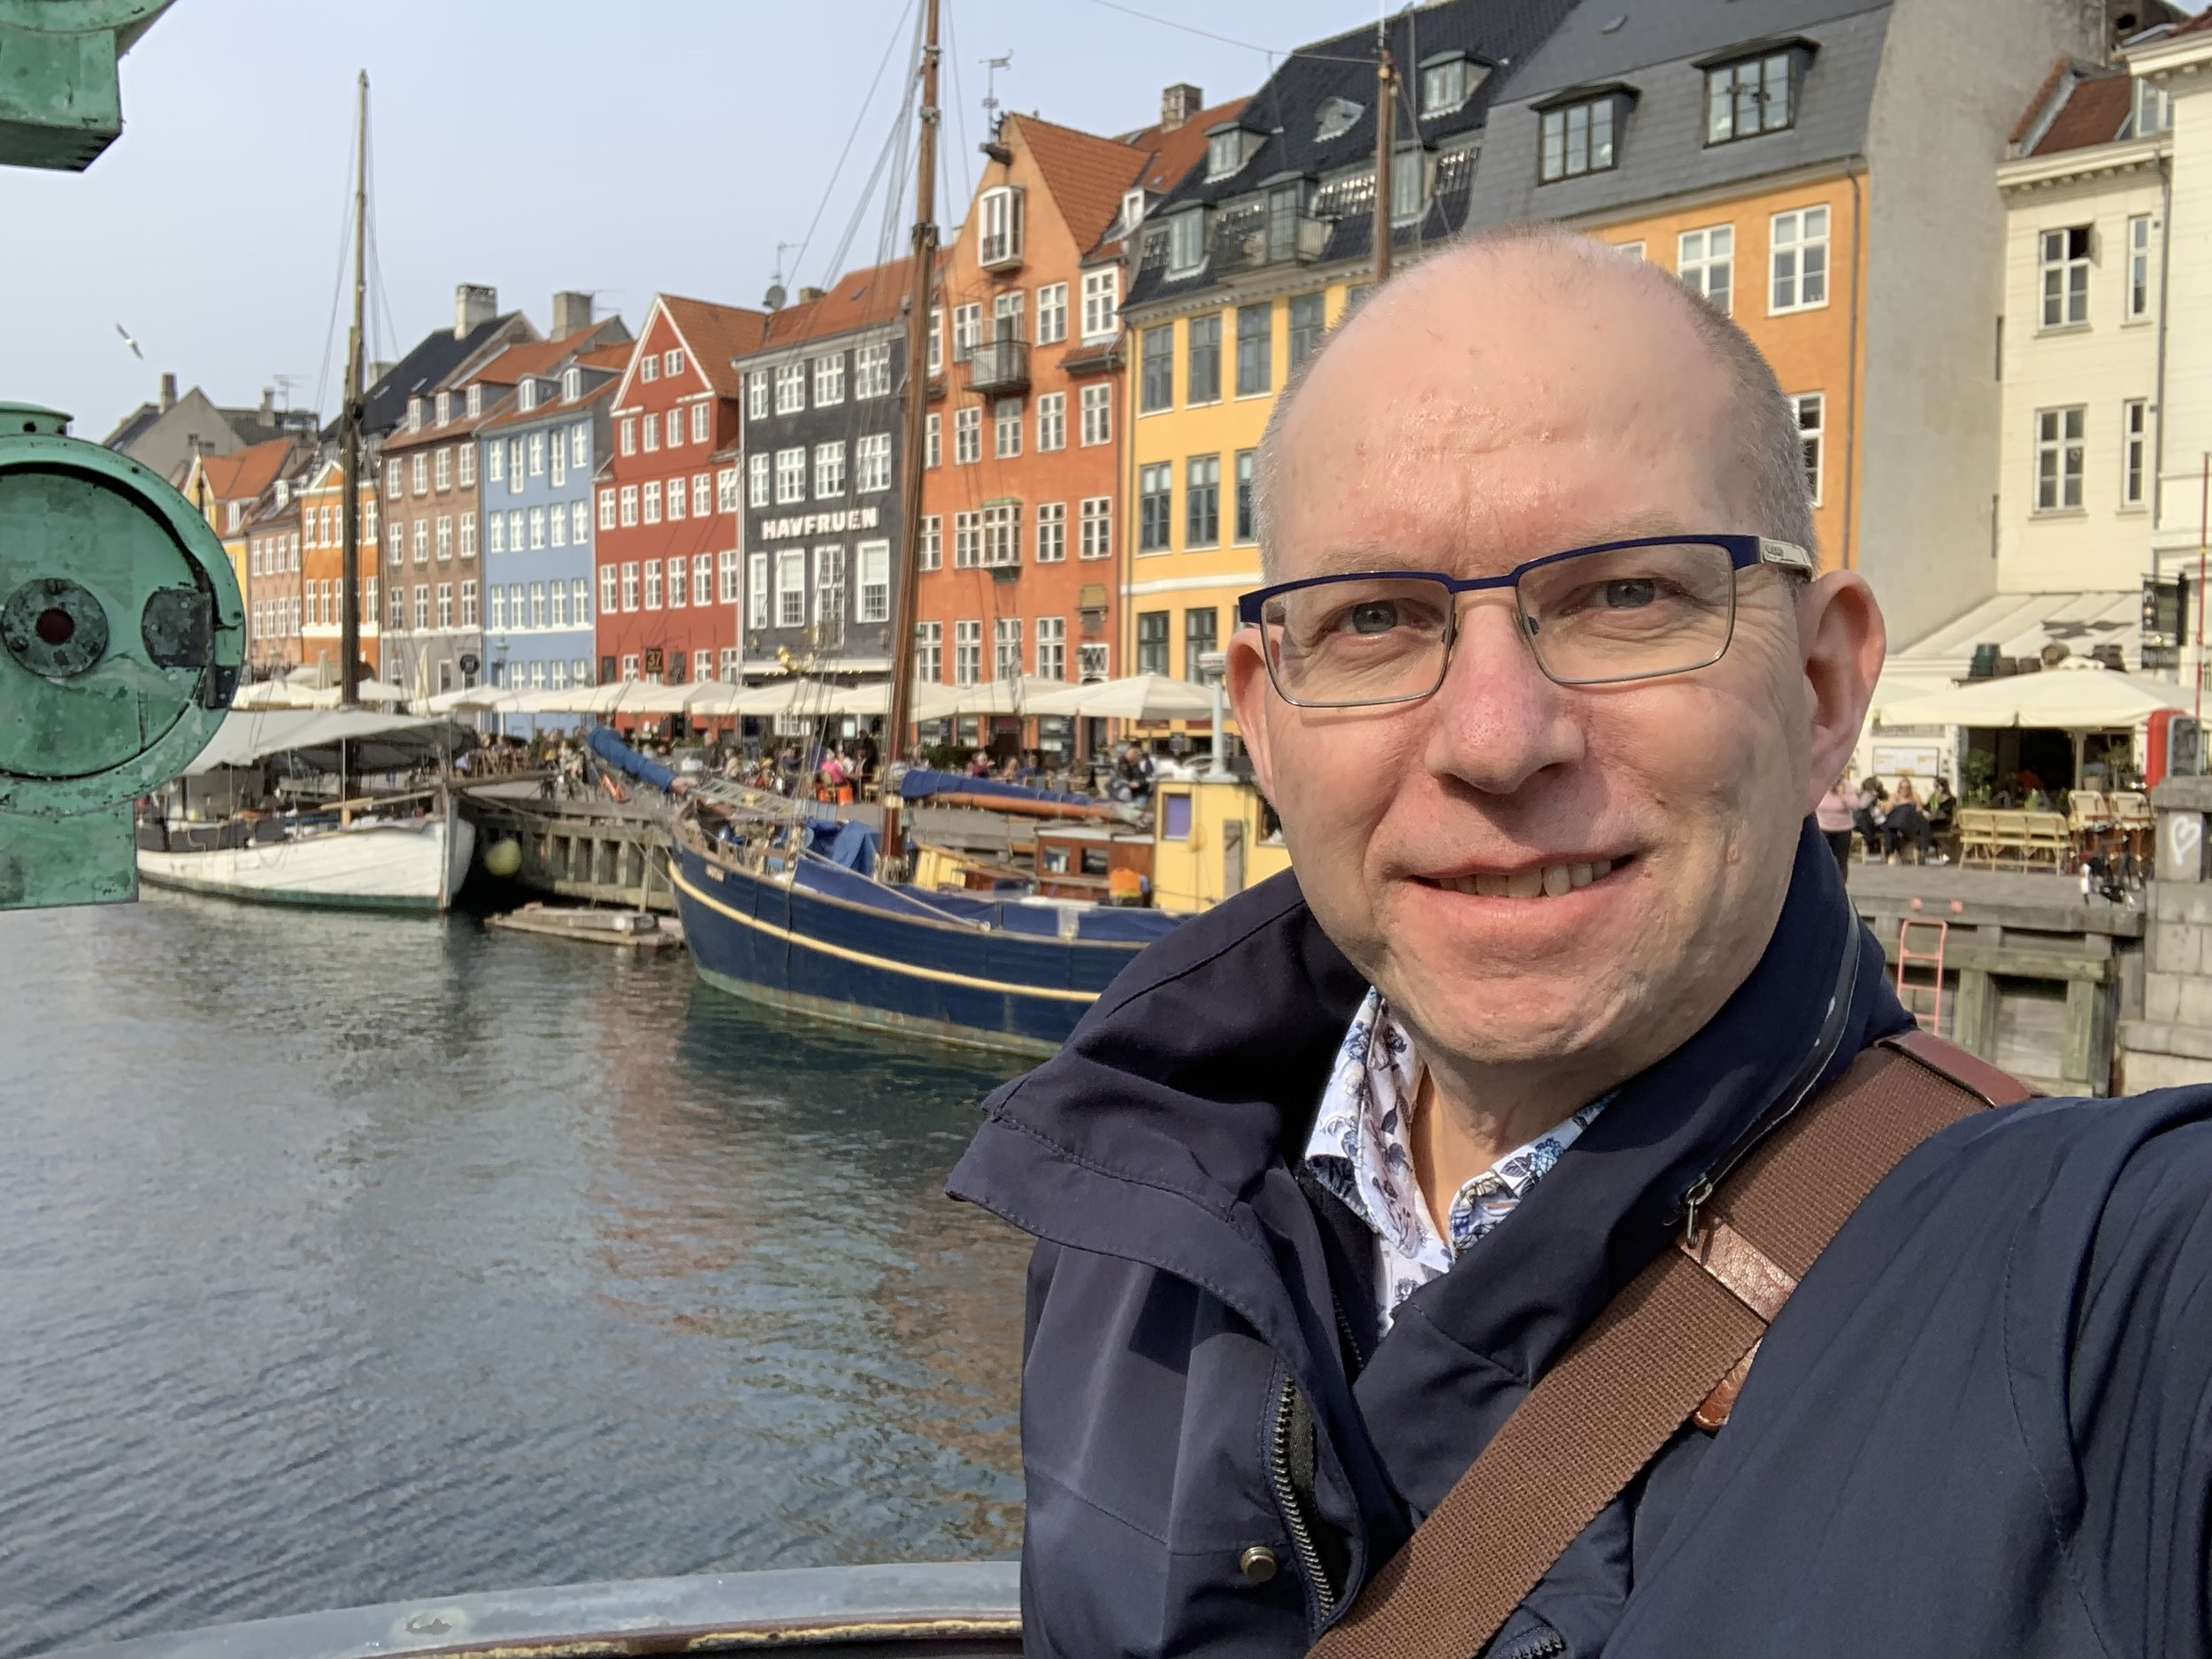 odd-roar-lange-københavn-thetravelinspector